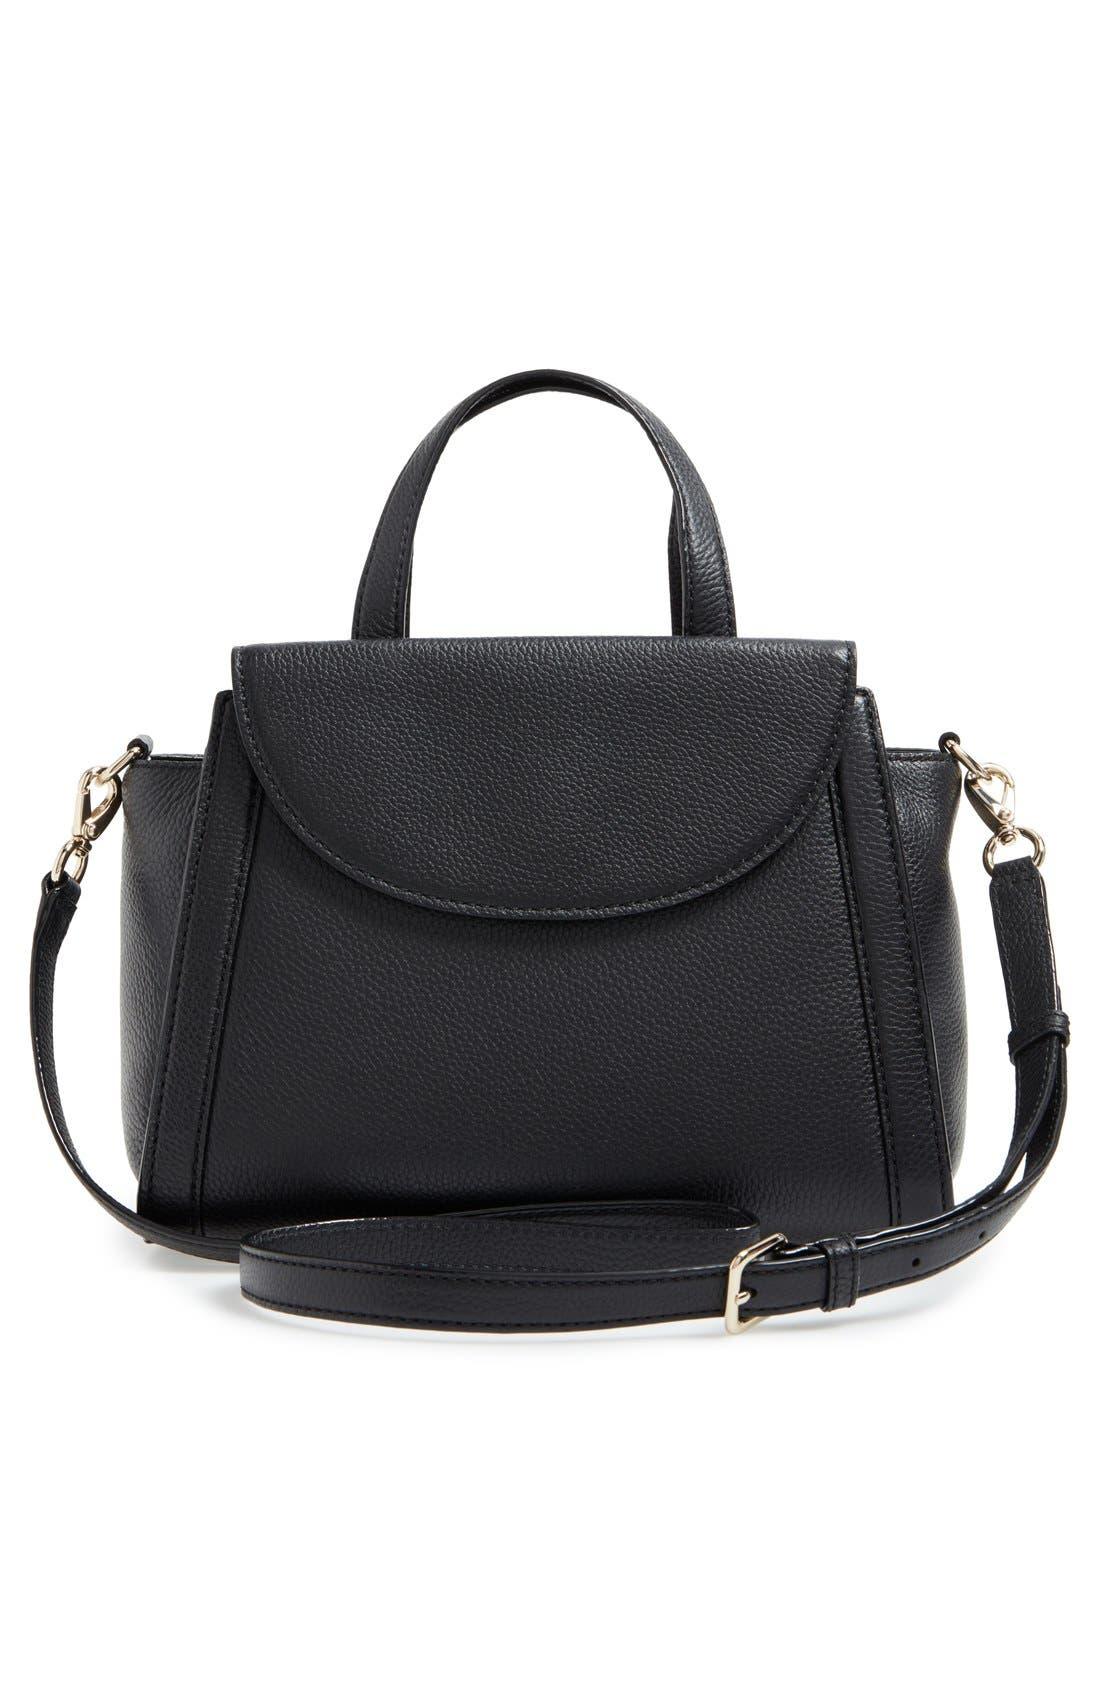 Alternate Image 3  - kate spade new york cobble hill - medium adrien leather satchel